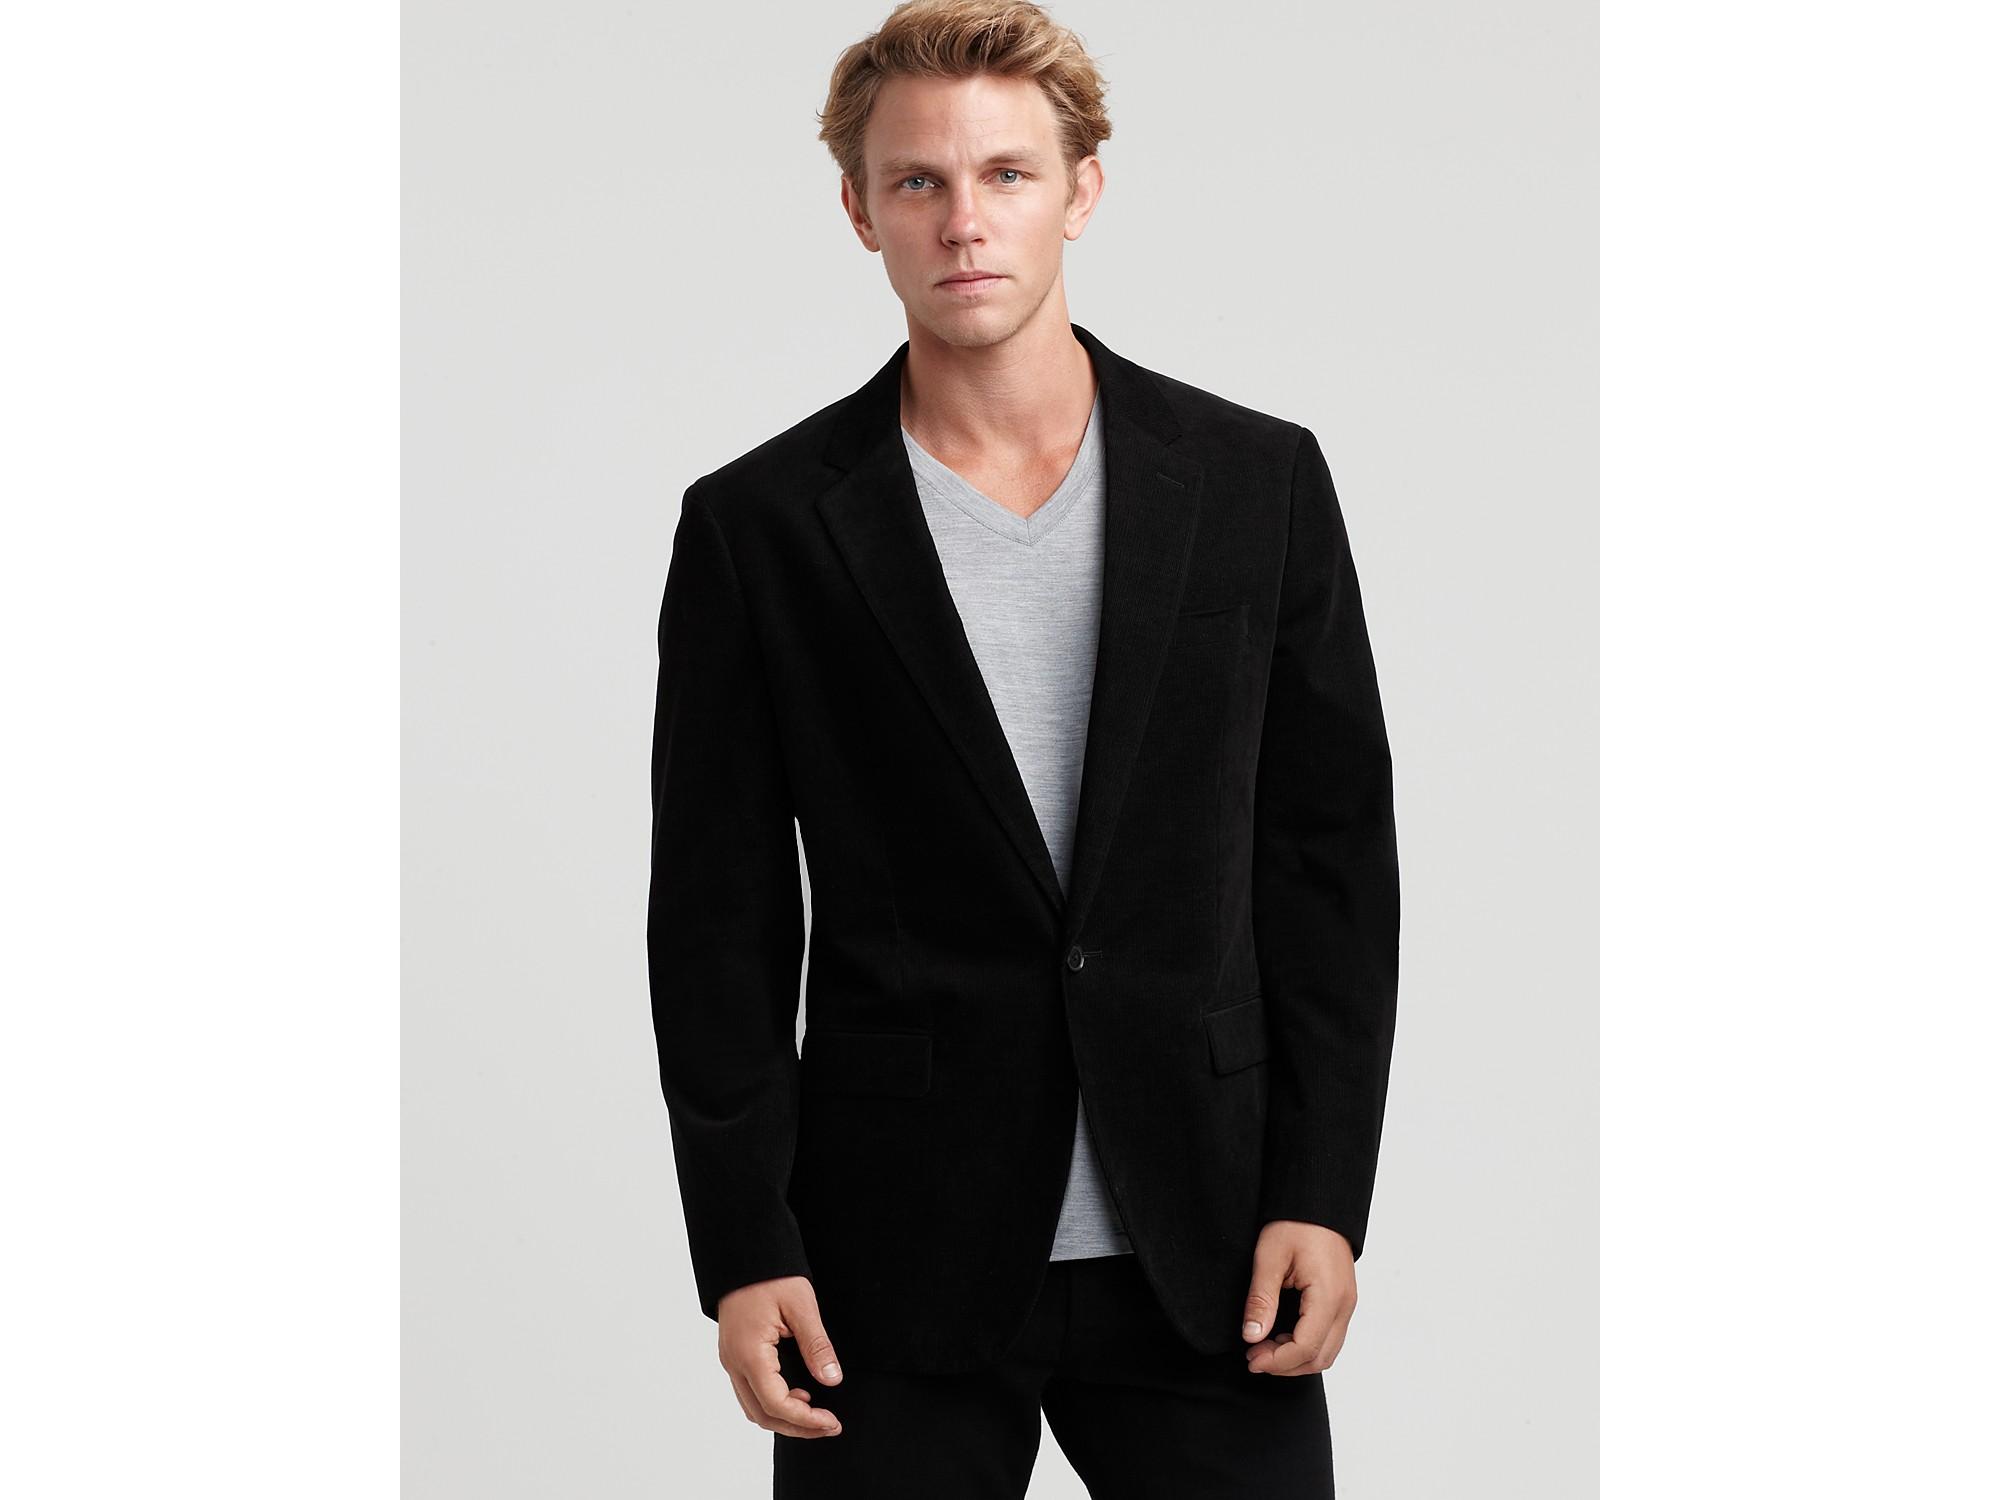 d71765185a Theory Kris Corduroy Blazer in Black for Men - Lyst